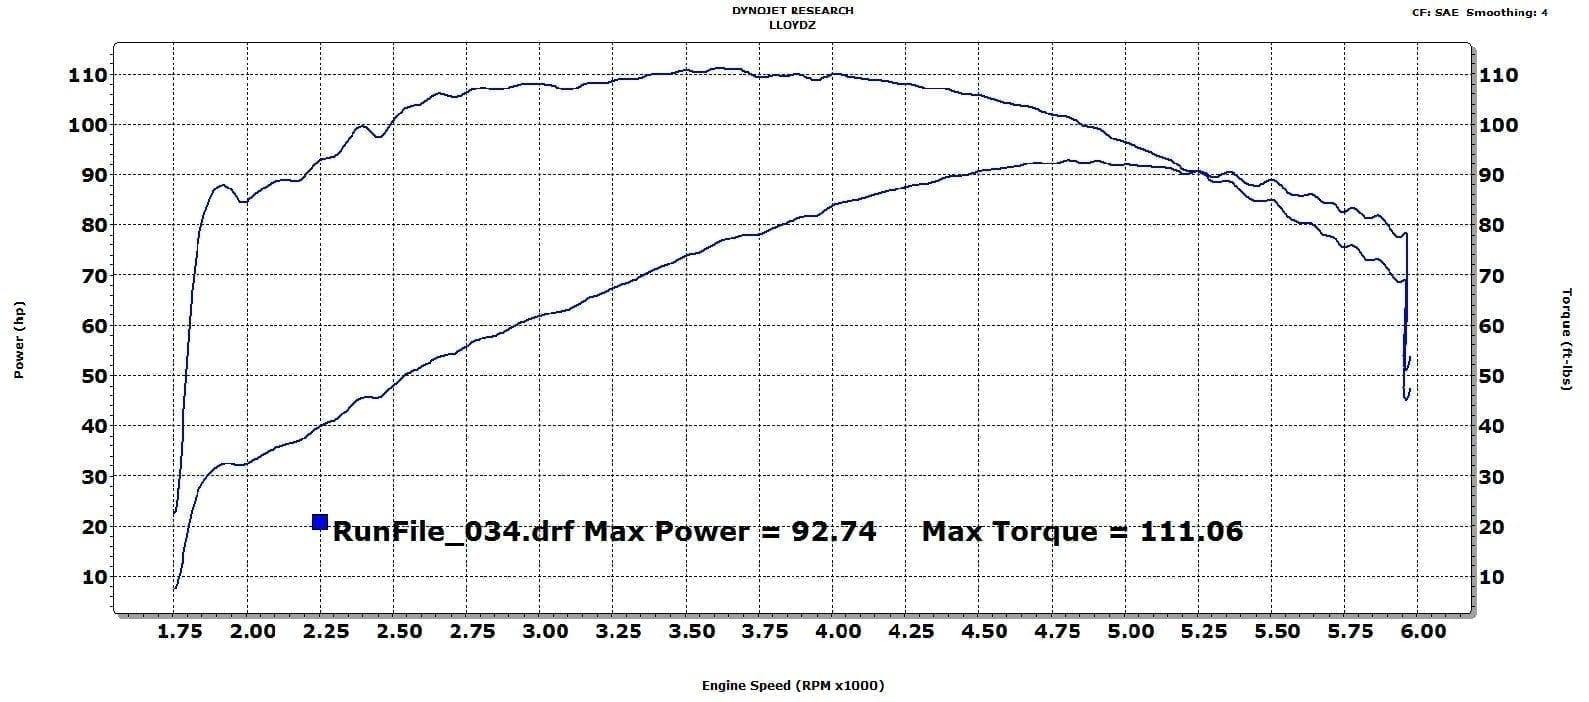 Dyno Graphs Lloydz Motorworkz Victory Engine Diagram 106ci Cross Country W Dd Exhaust Pts Xf